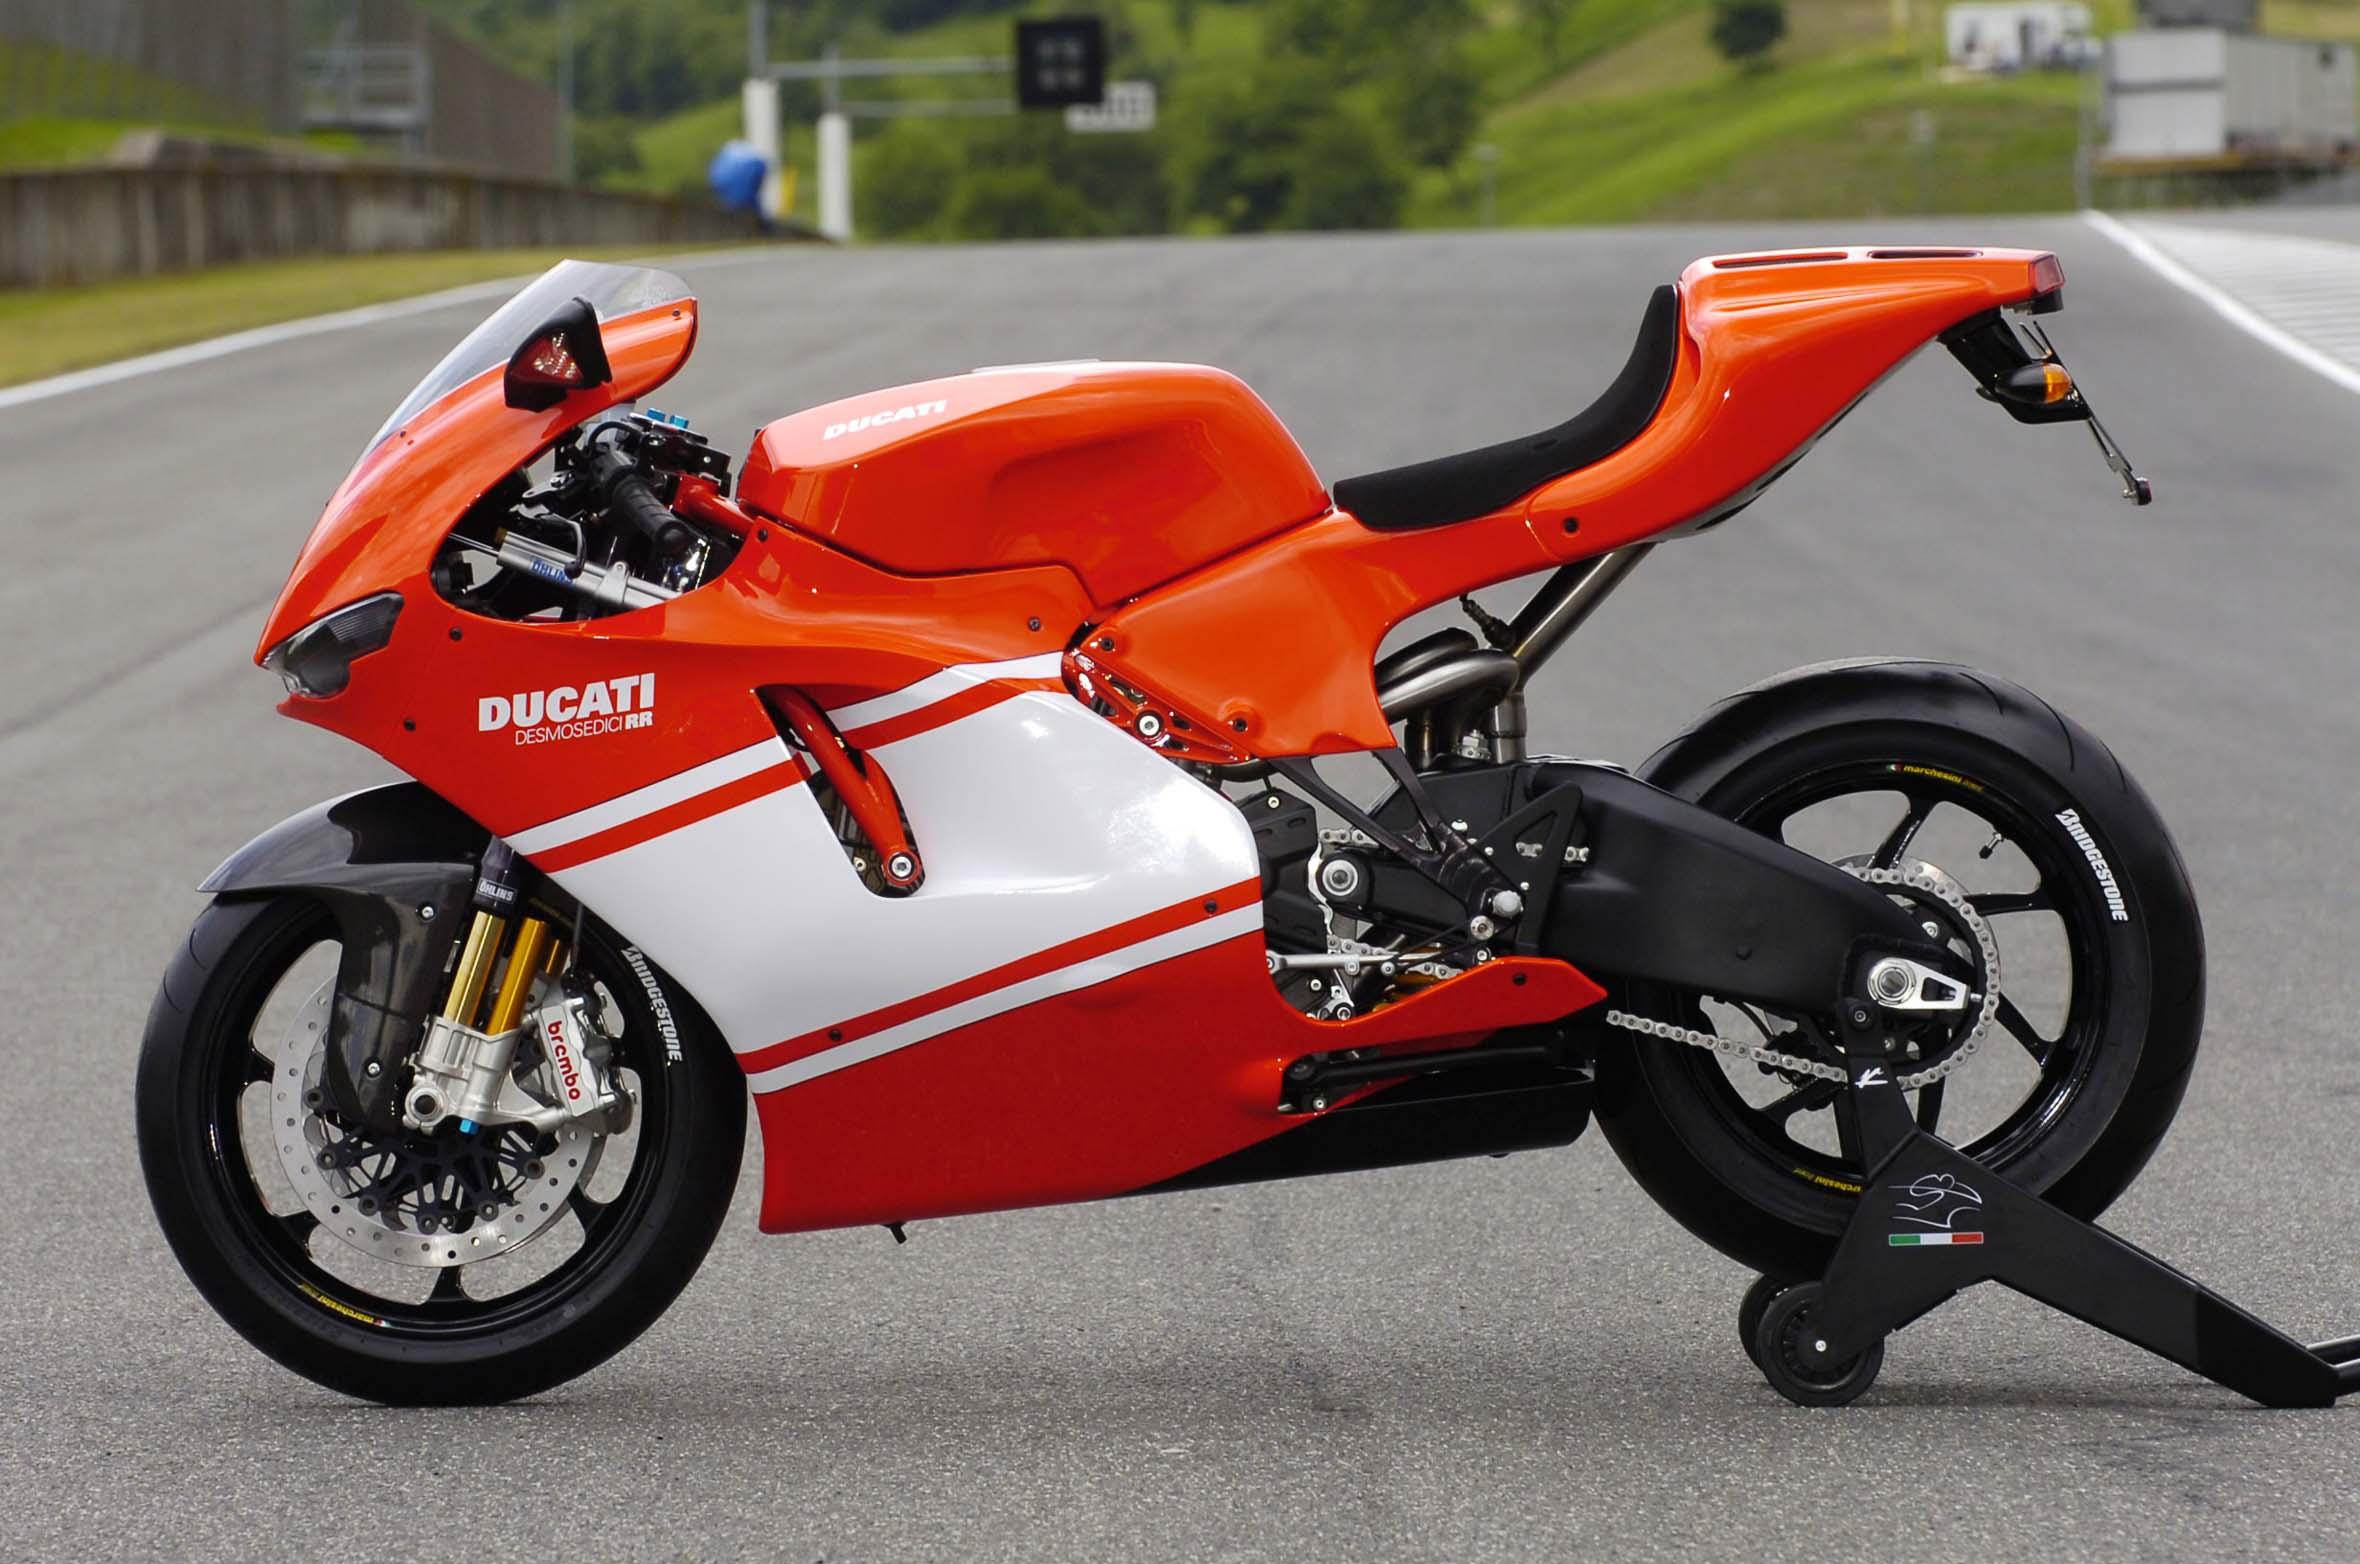 Ducati Desmosedici RR, The Original Ducati V4 Superbike - Asphalt & Rubber